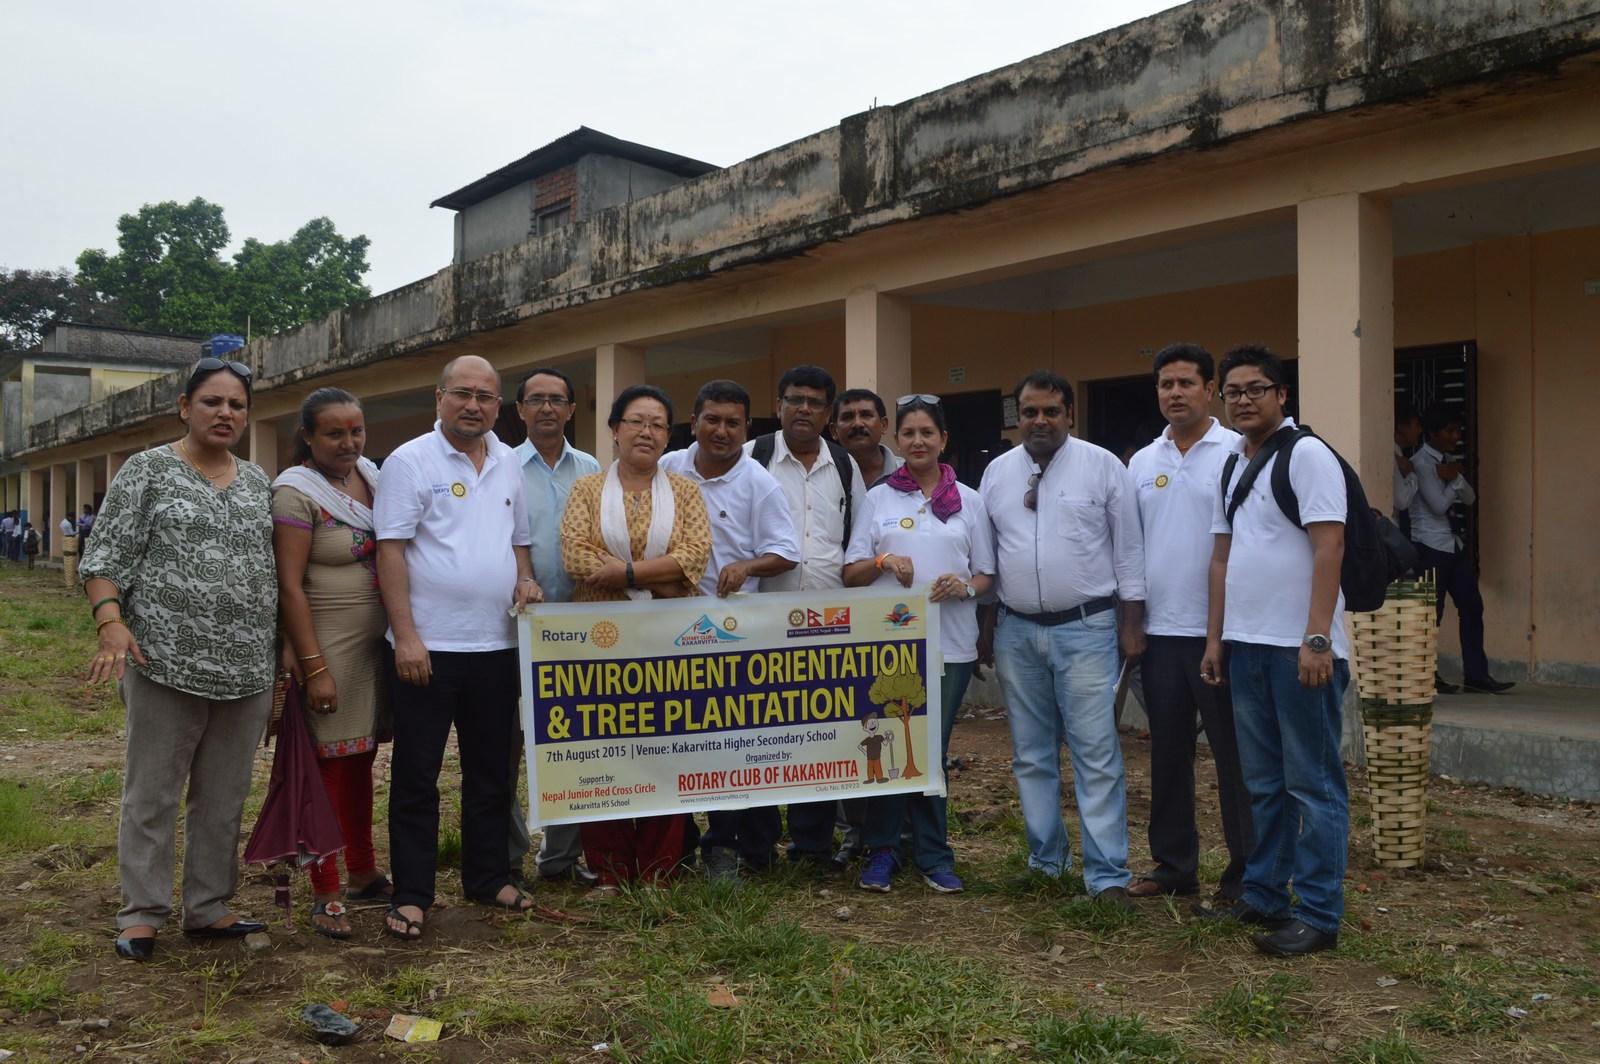 Enviroment Orientation Tree Plantation Rotary Club Of Kakarvitta 17